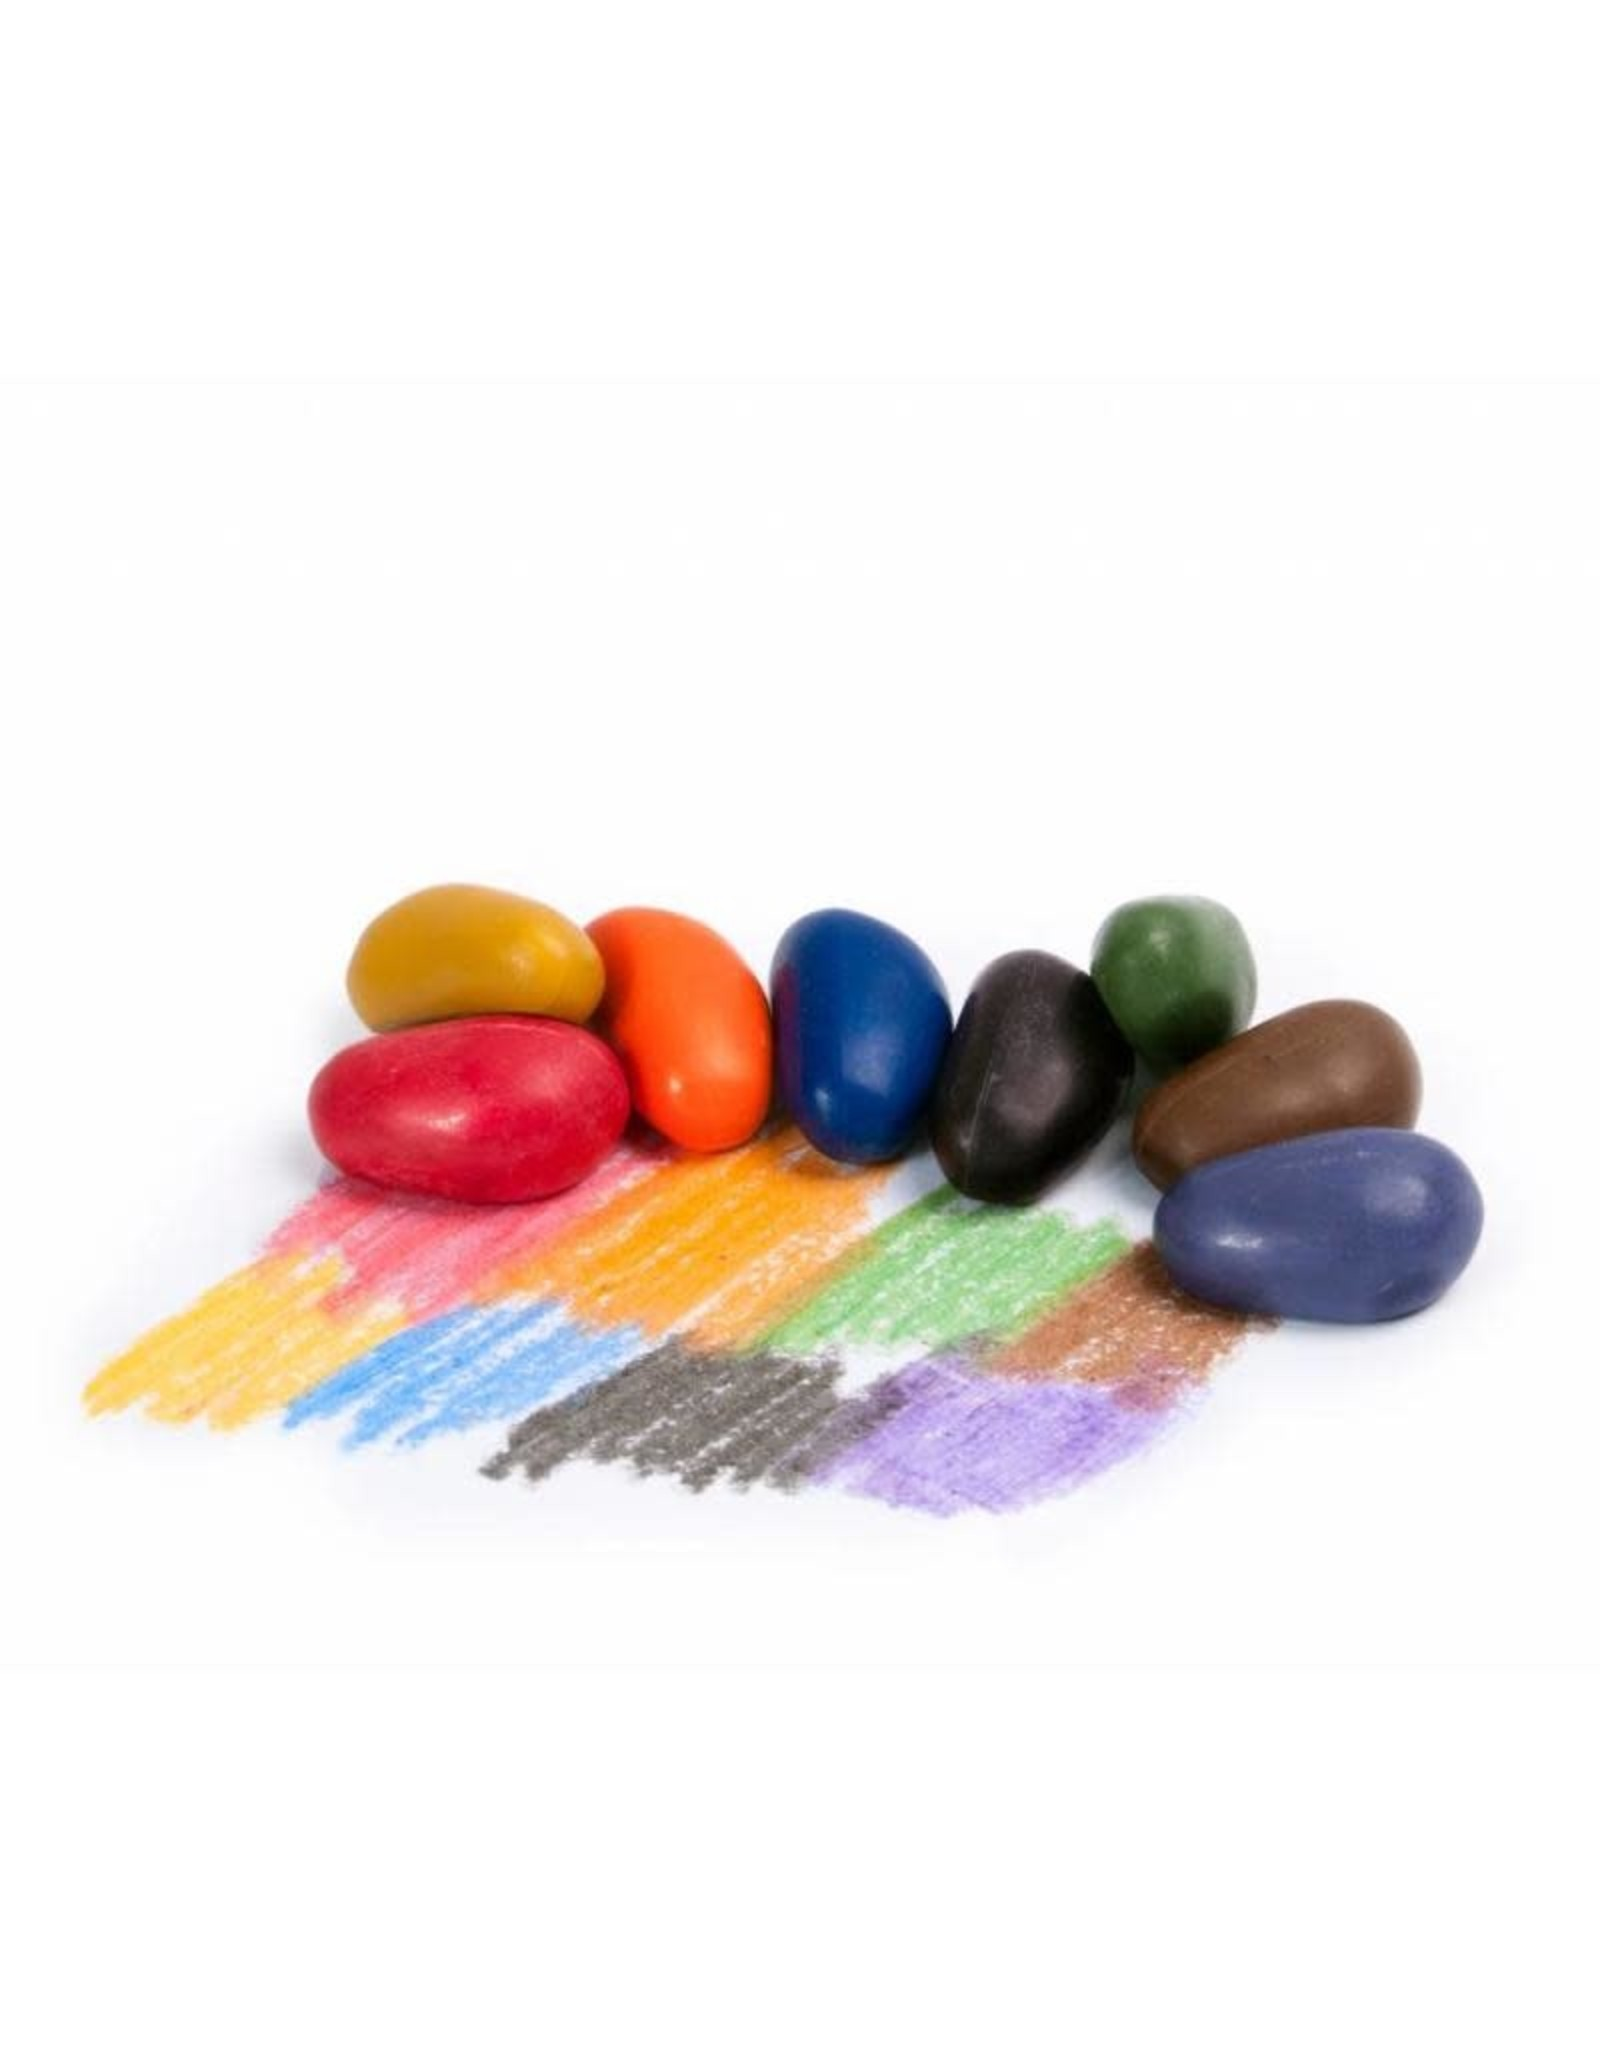 Crayon Rocks 8 crayon rocks in katoenen zakje